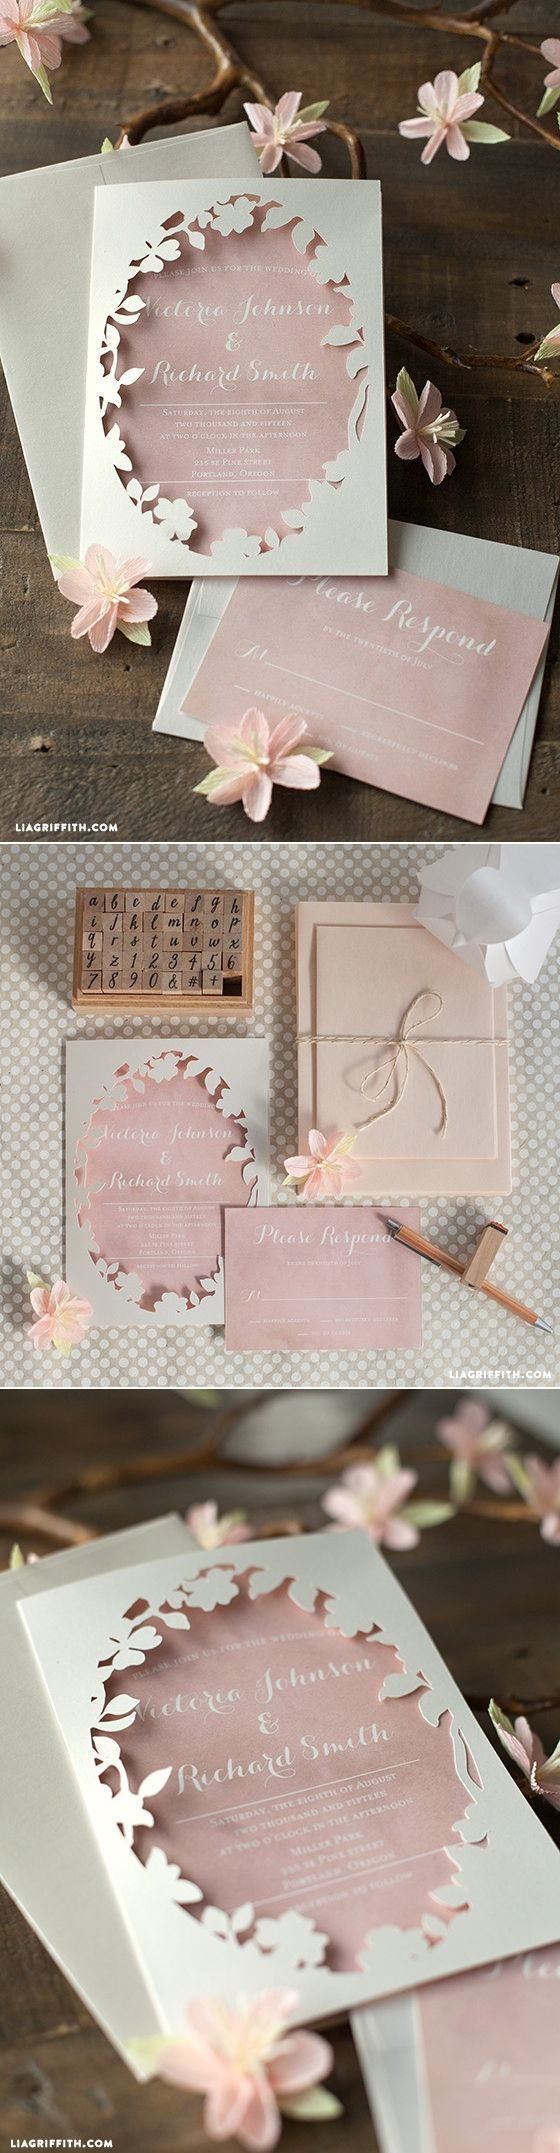 best svg images on pinterest invitation cards invitation